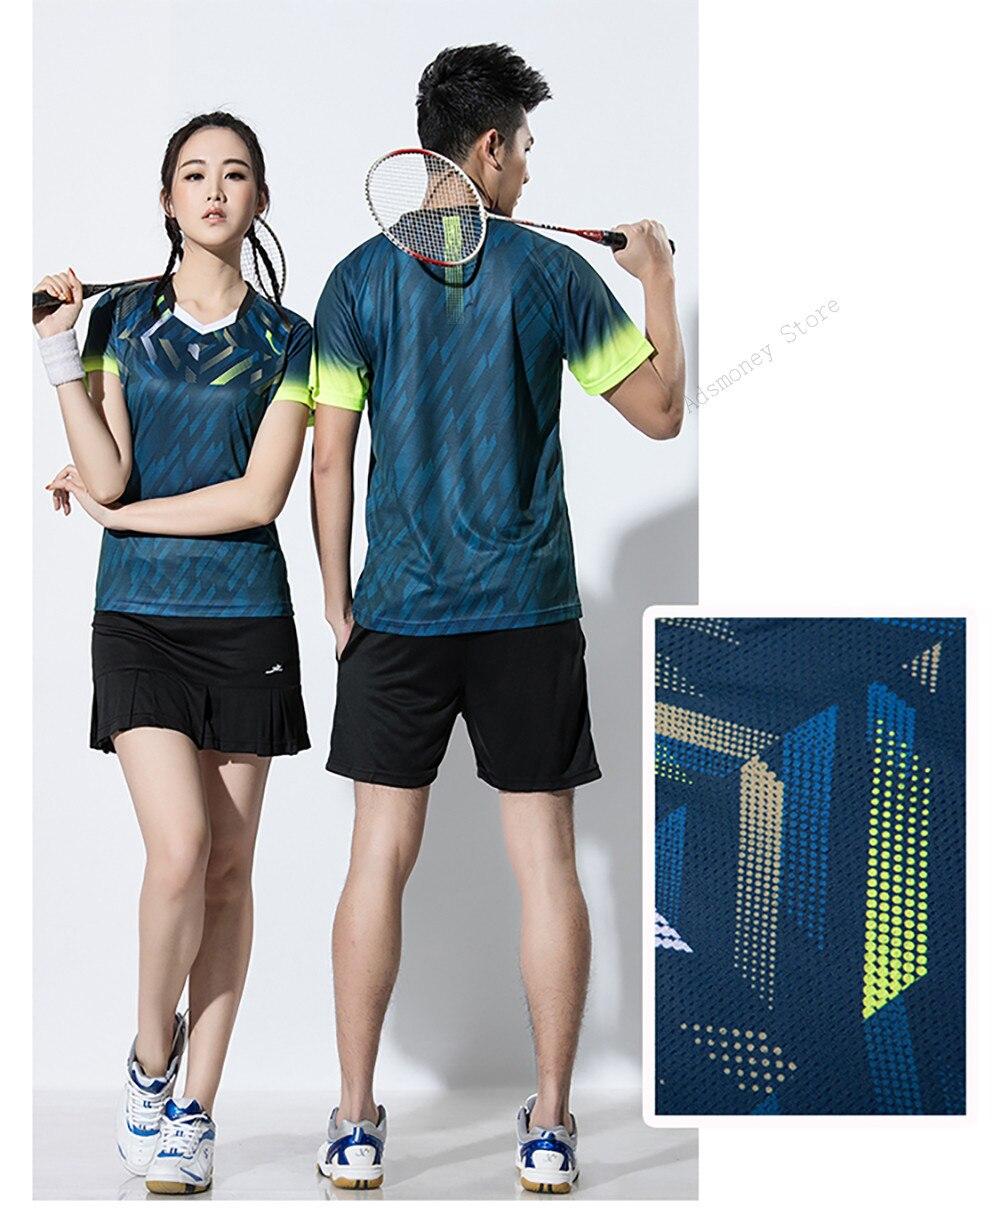 Uniformes Roupas De Tênis Badminton Respirável Camisetas & Shorts